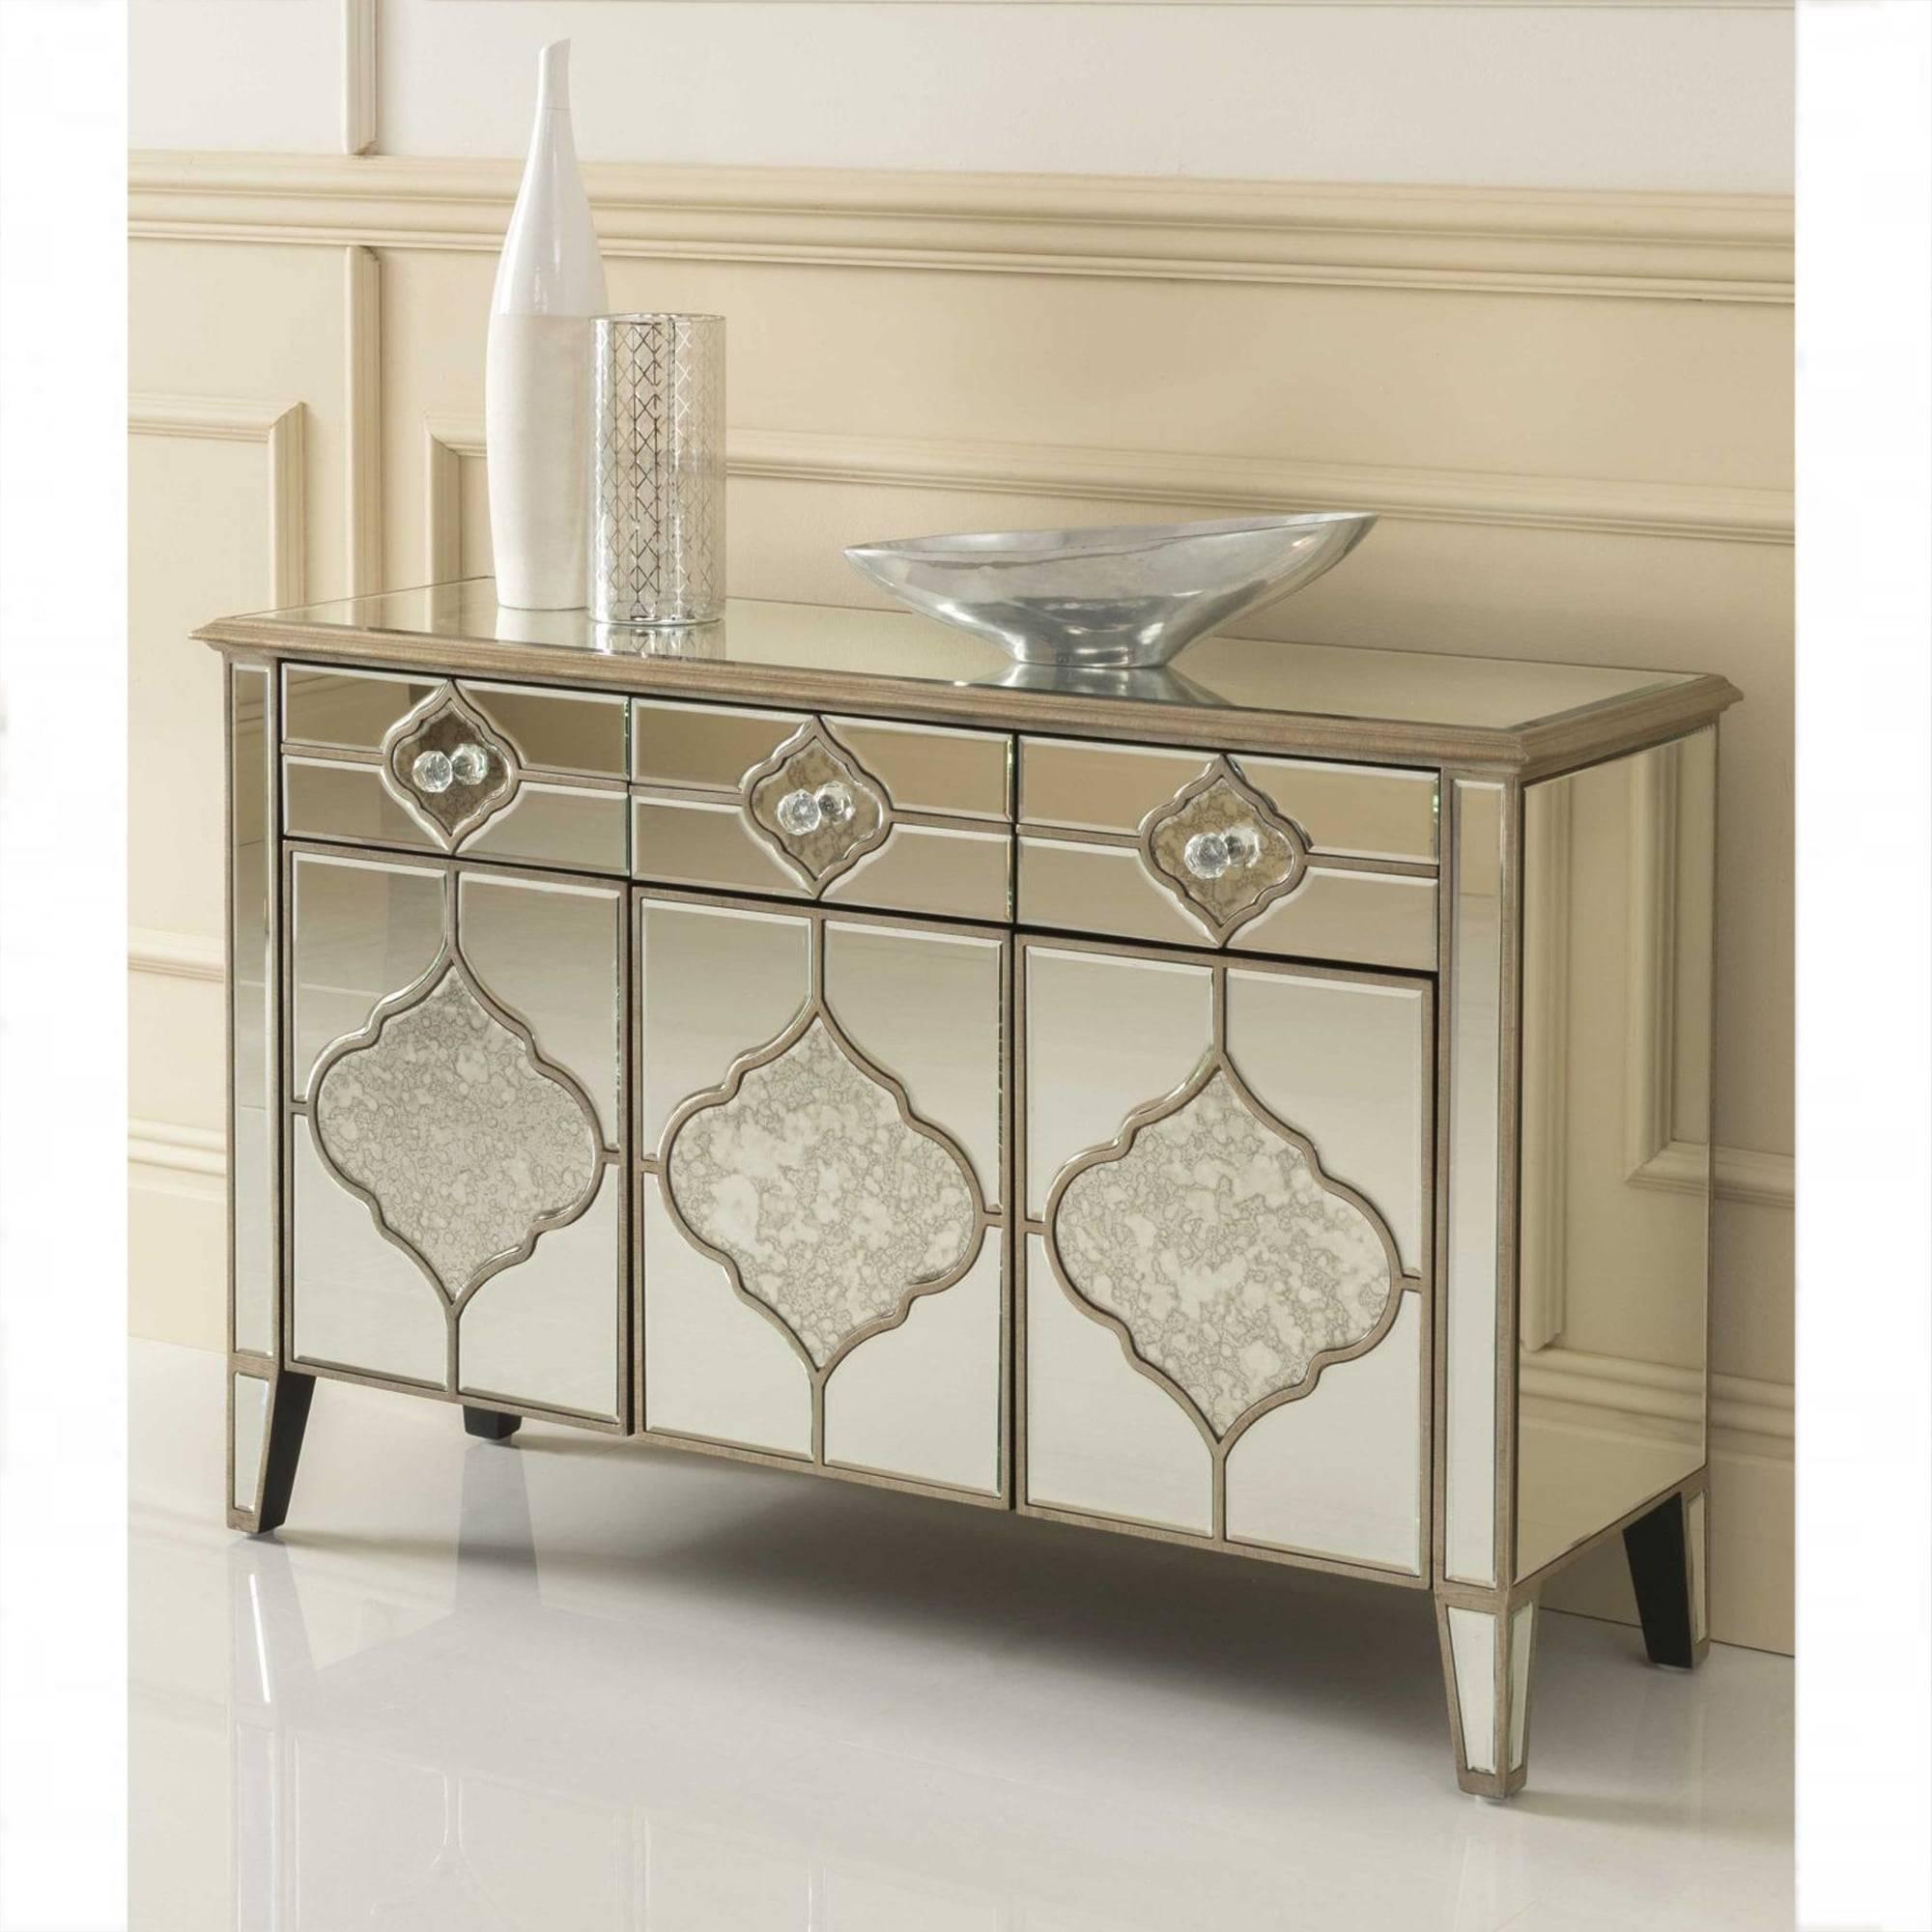 Sassari Mirrored Sideboard | Venetian Glass Furniture With Regard To Mirrored Sideboards (View 3 of 20)